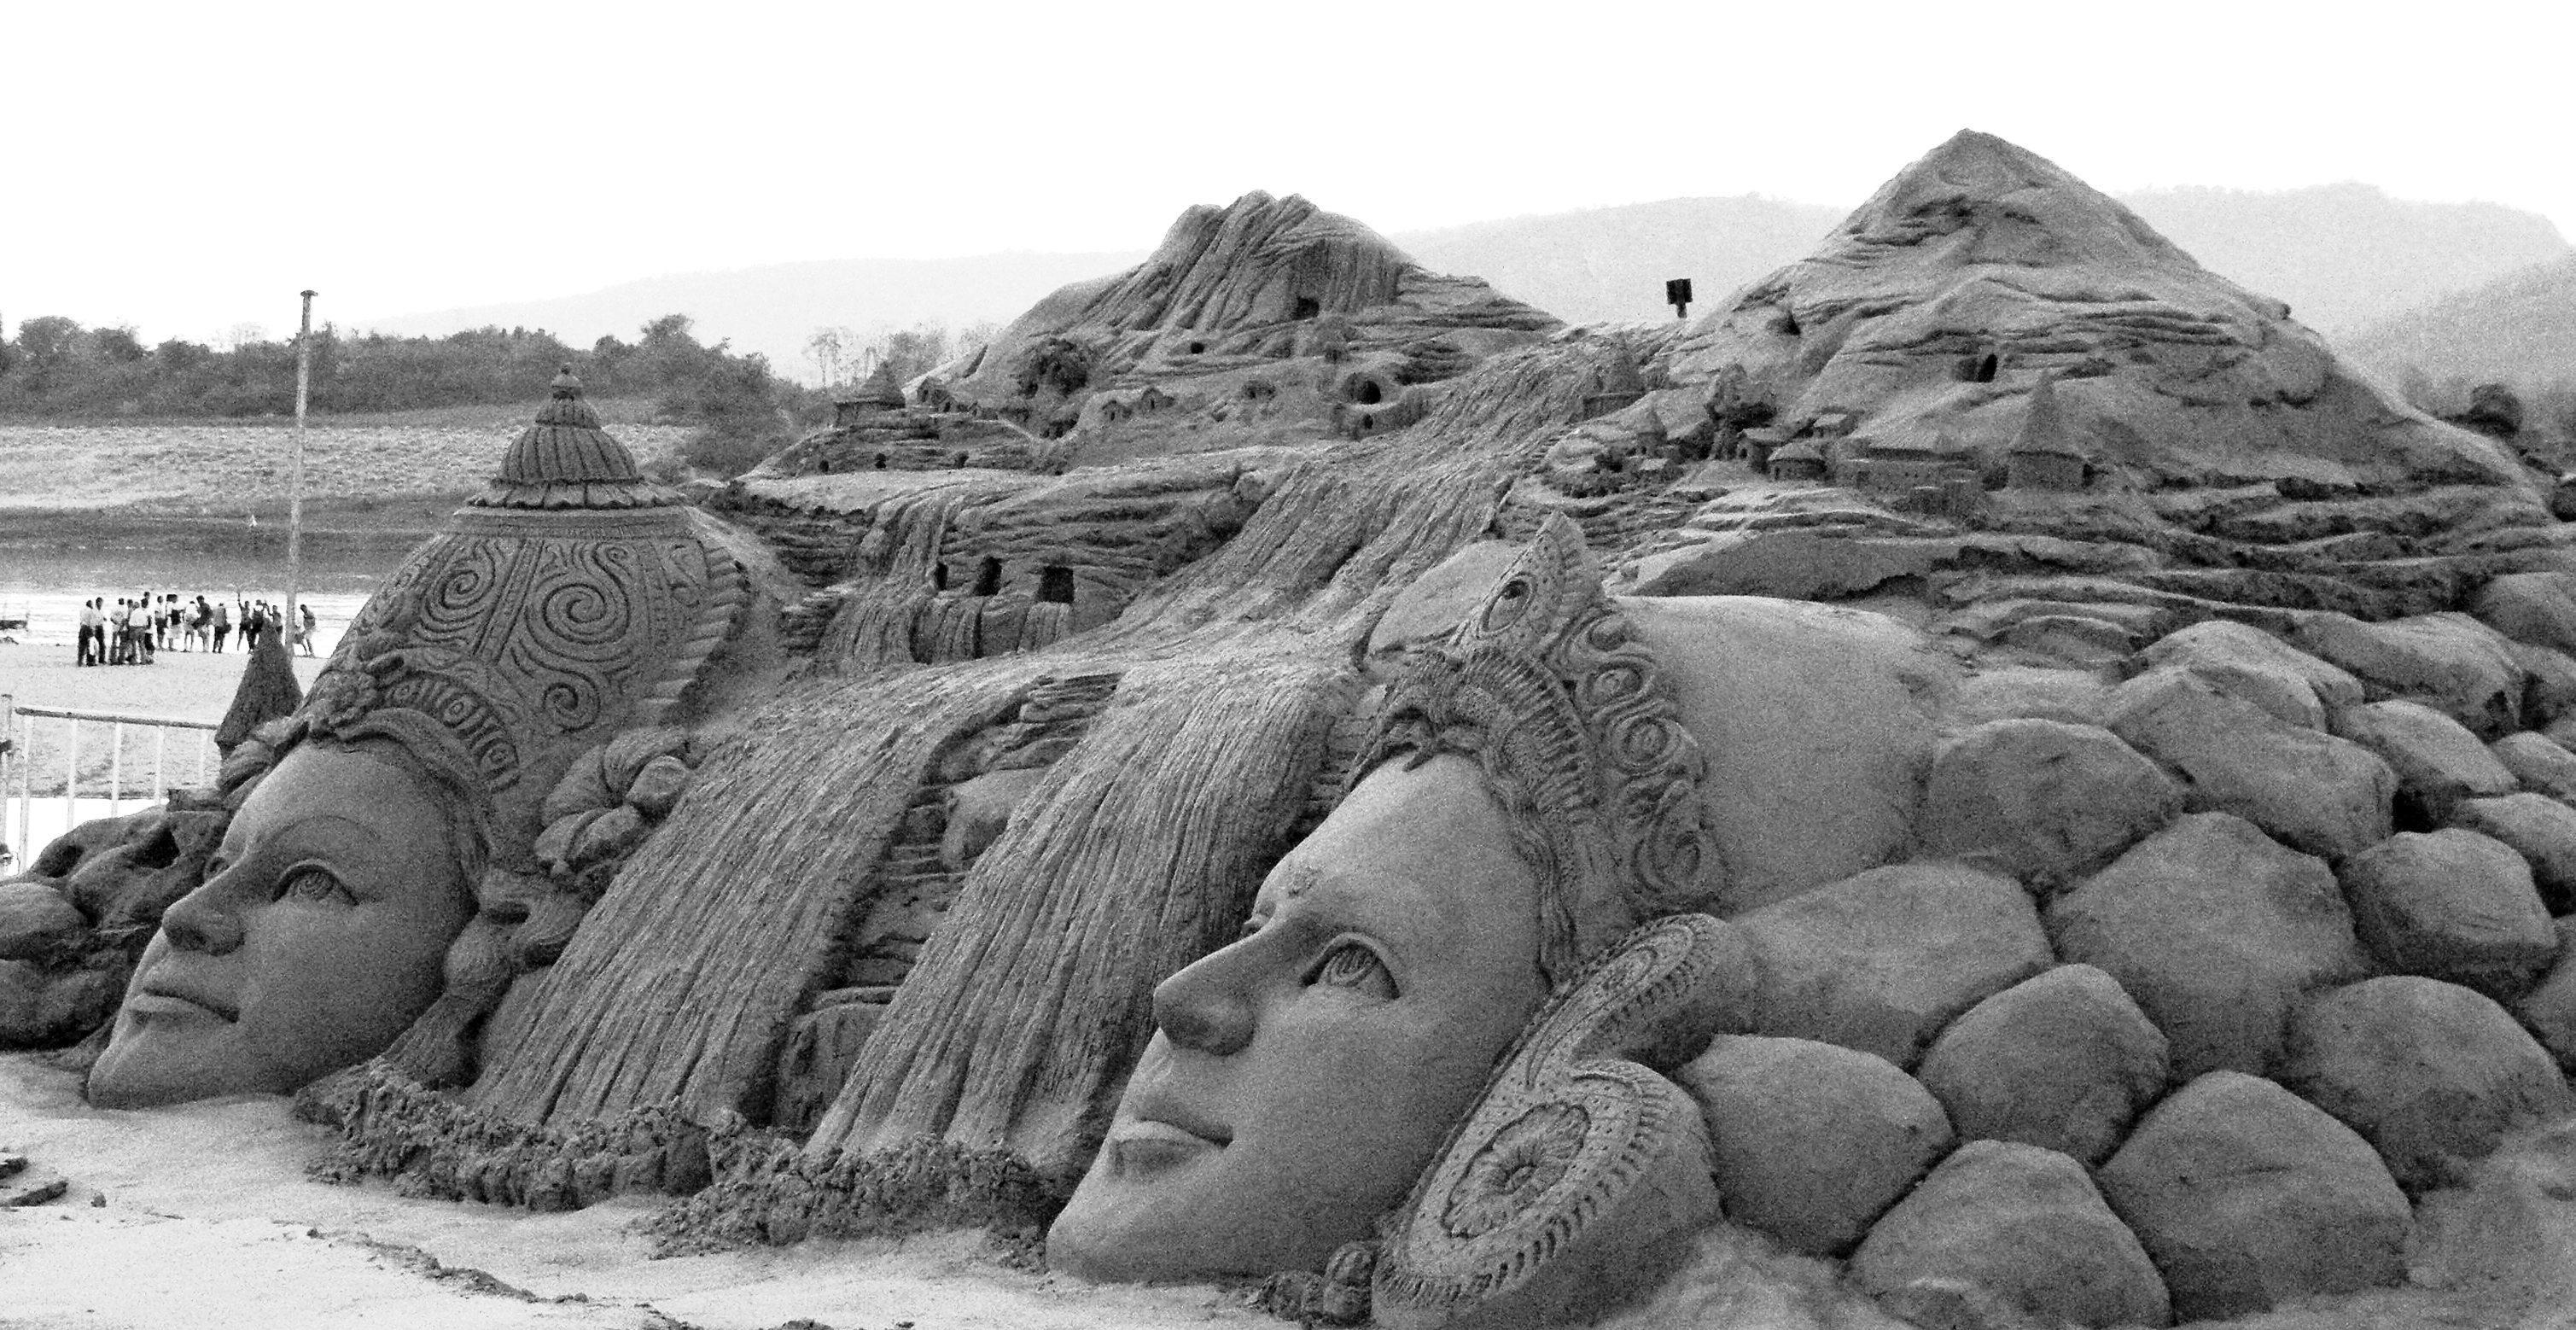 Sand_sculpture_at_Bandrabhan,Hoshangabad.JPG